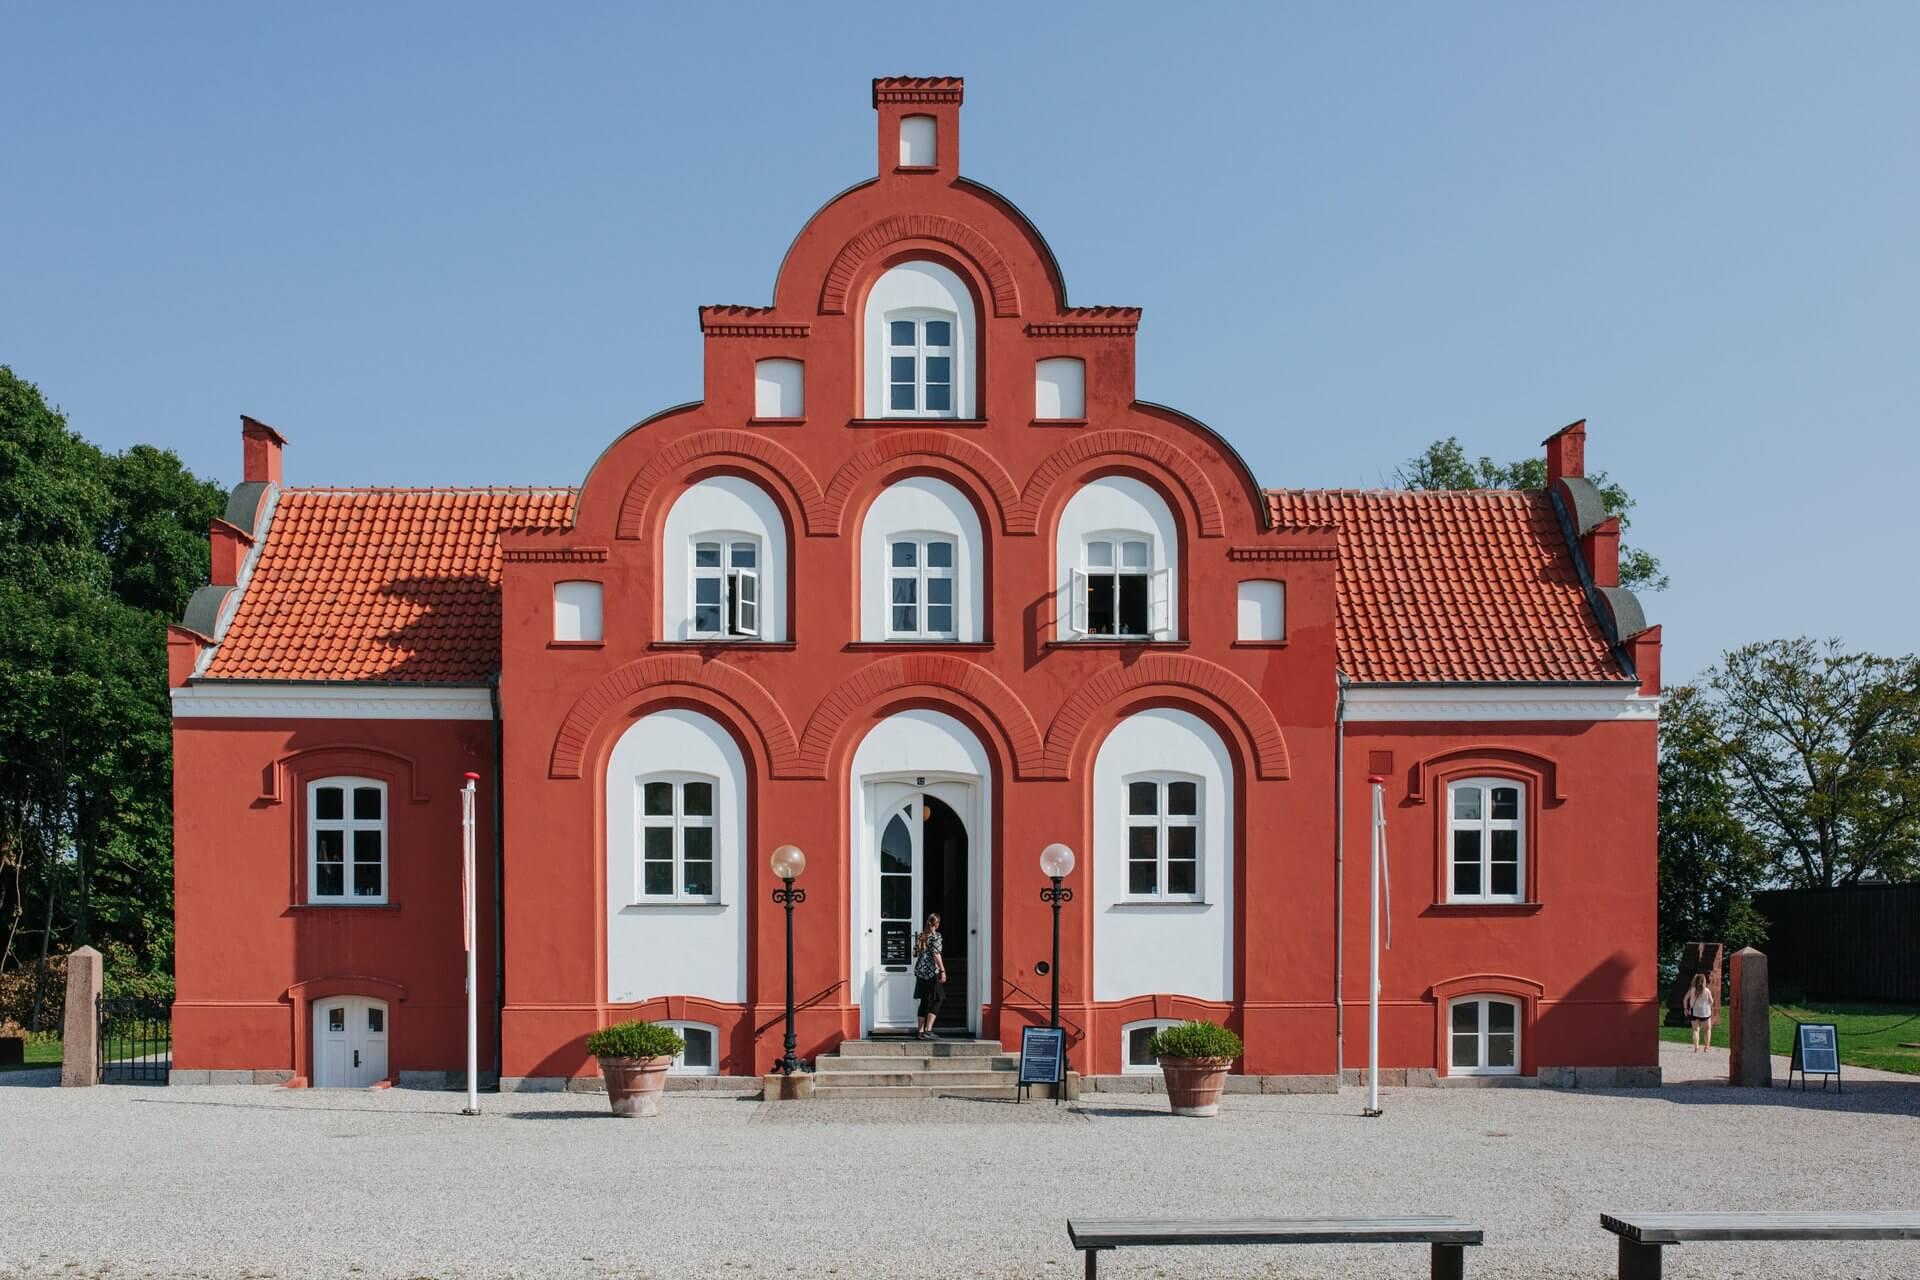 Clay Museet, Middelfart (Foto: Michal Fiukowski og Sarah Moritz)